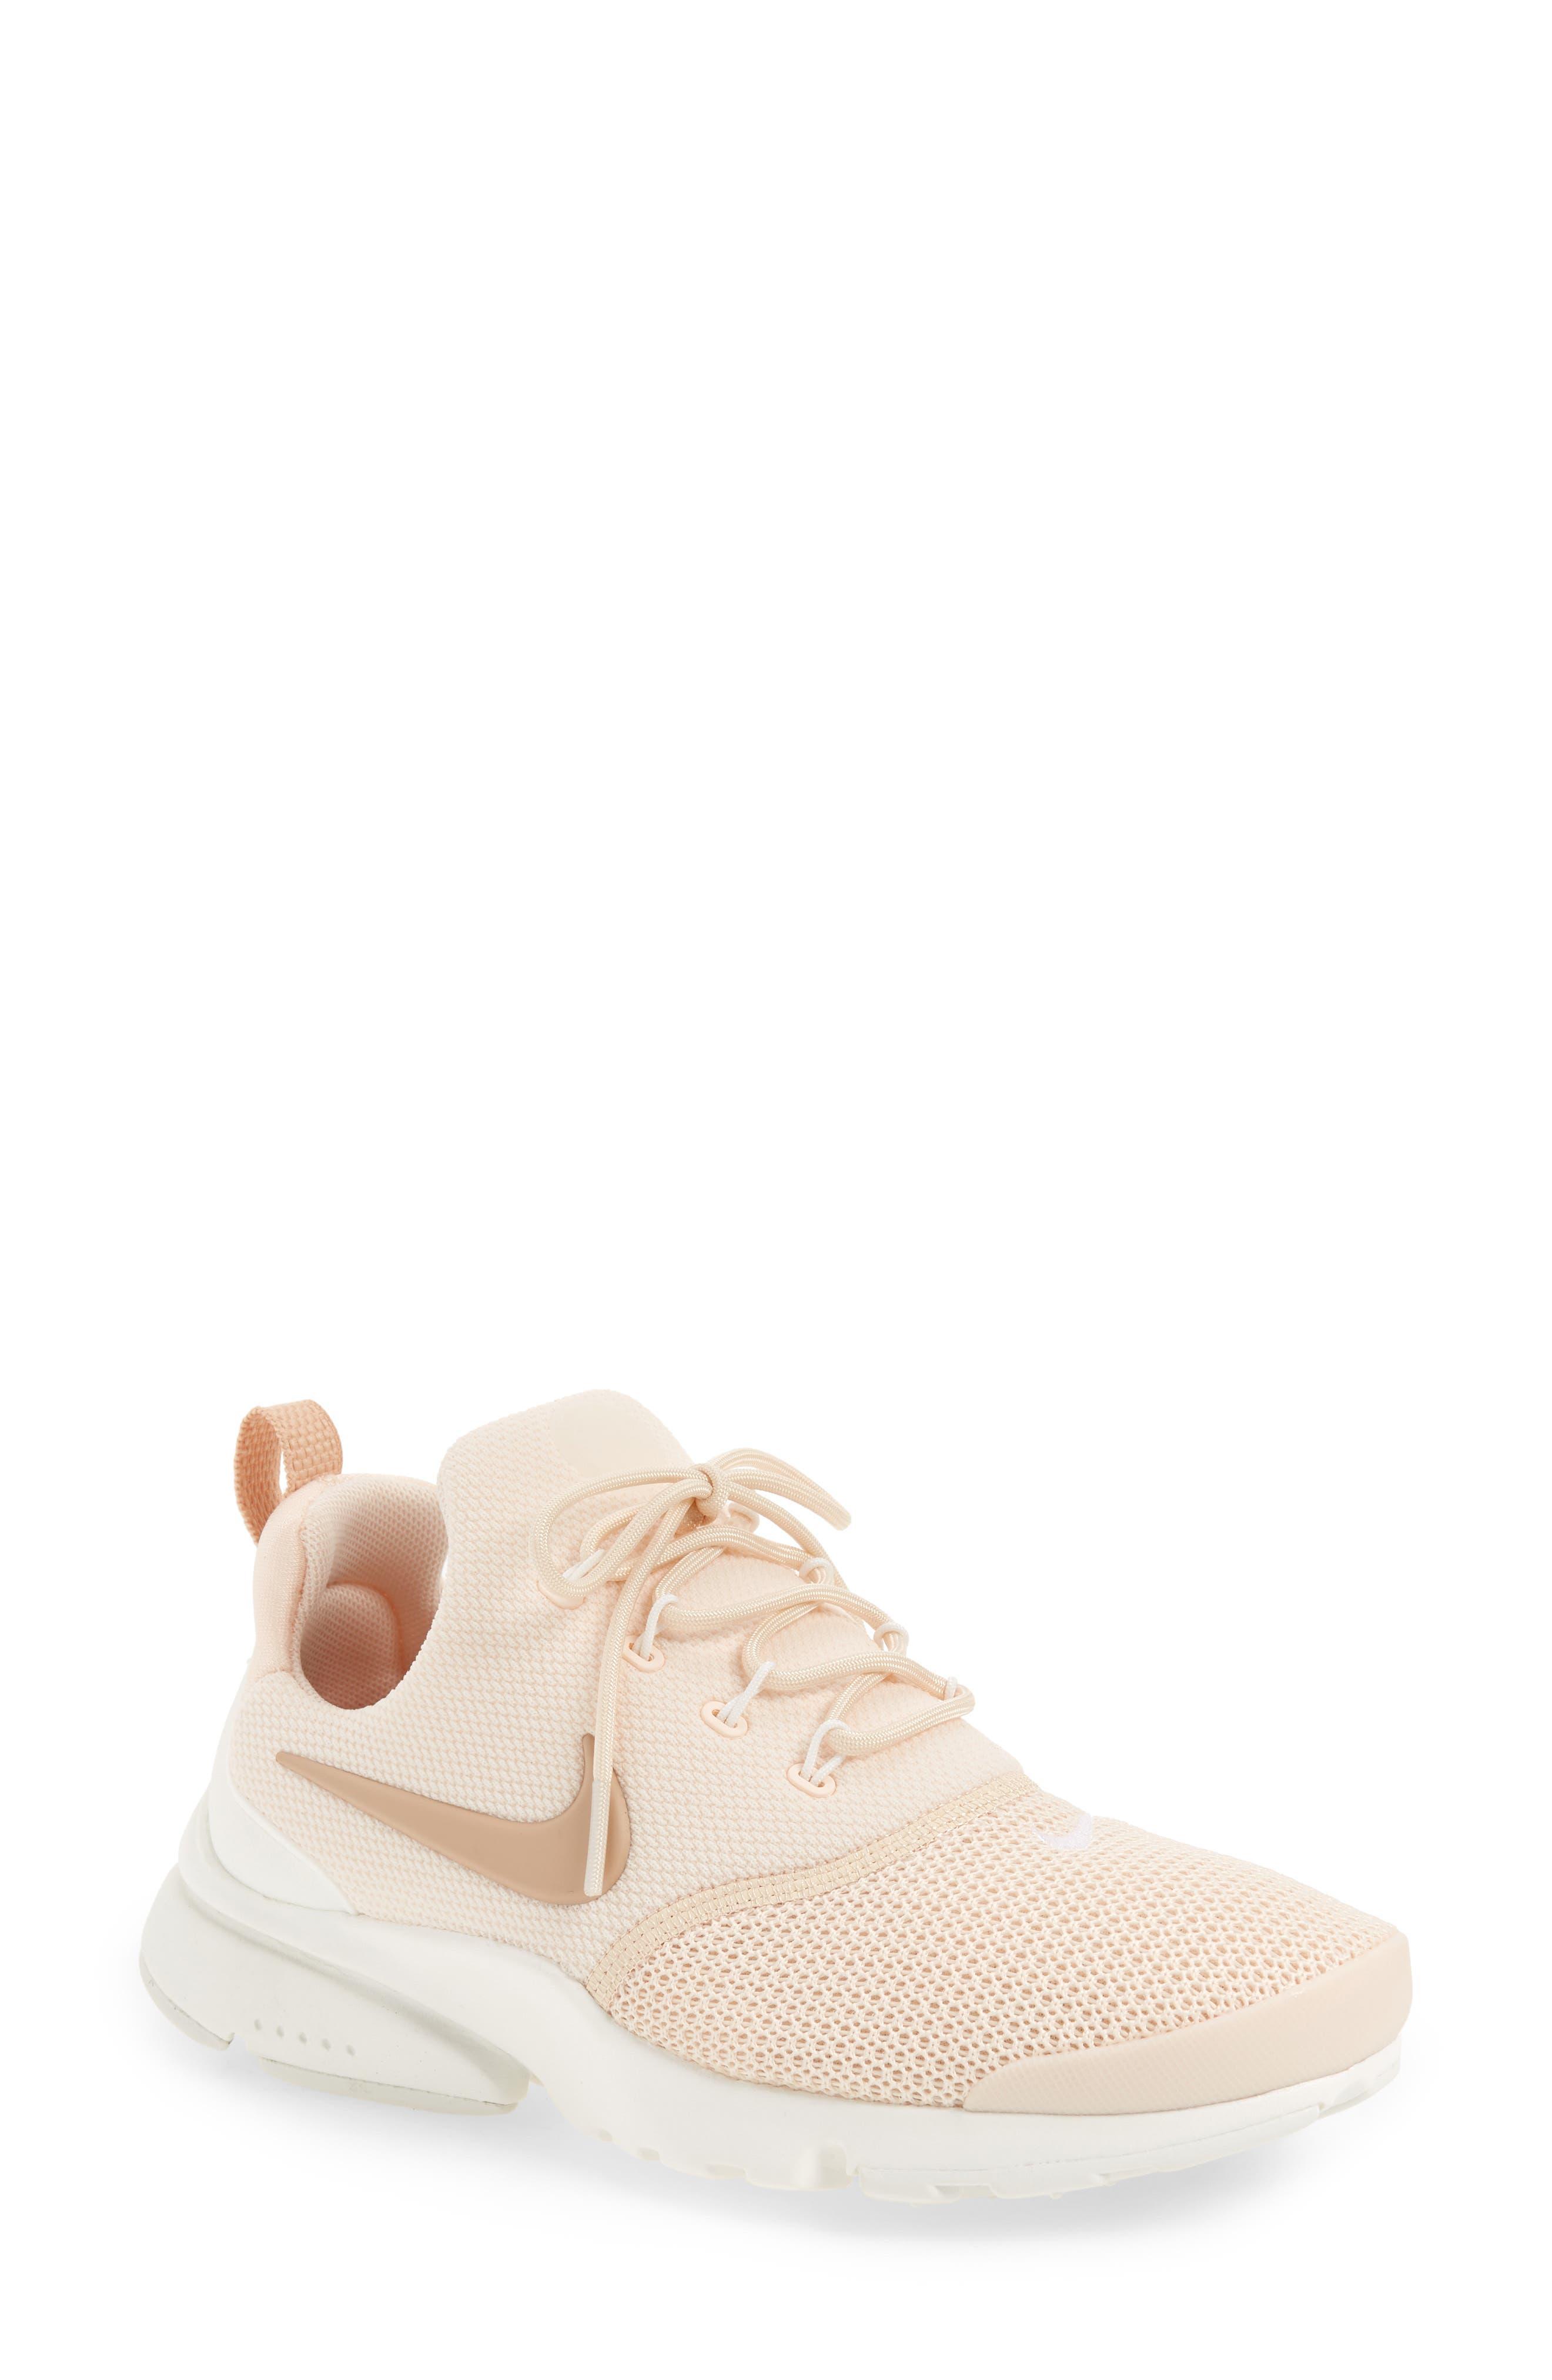 56ecad949 Nike Presto Fly Sneaker In Guava Ice/ Beige/ Summit White | ModeSens